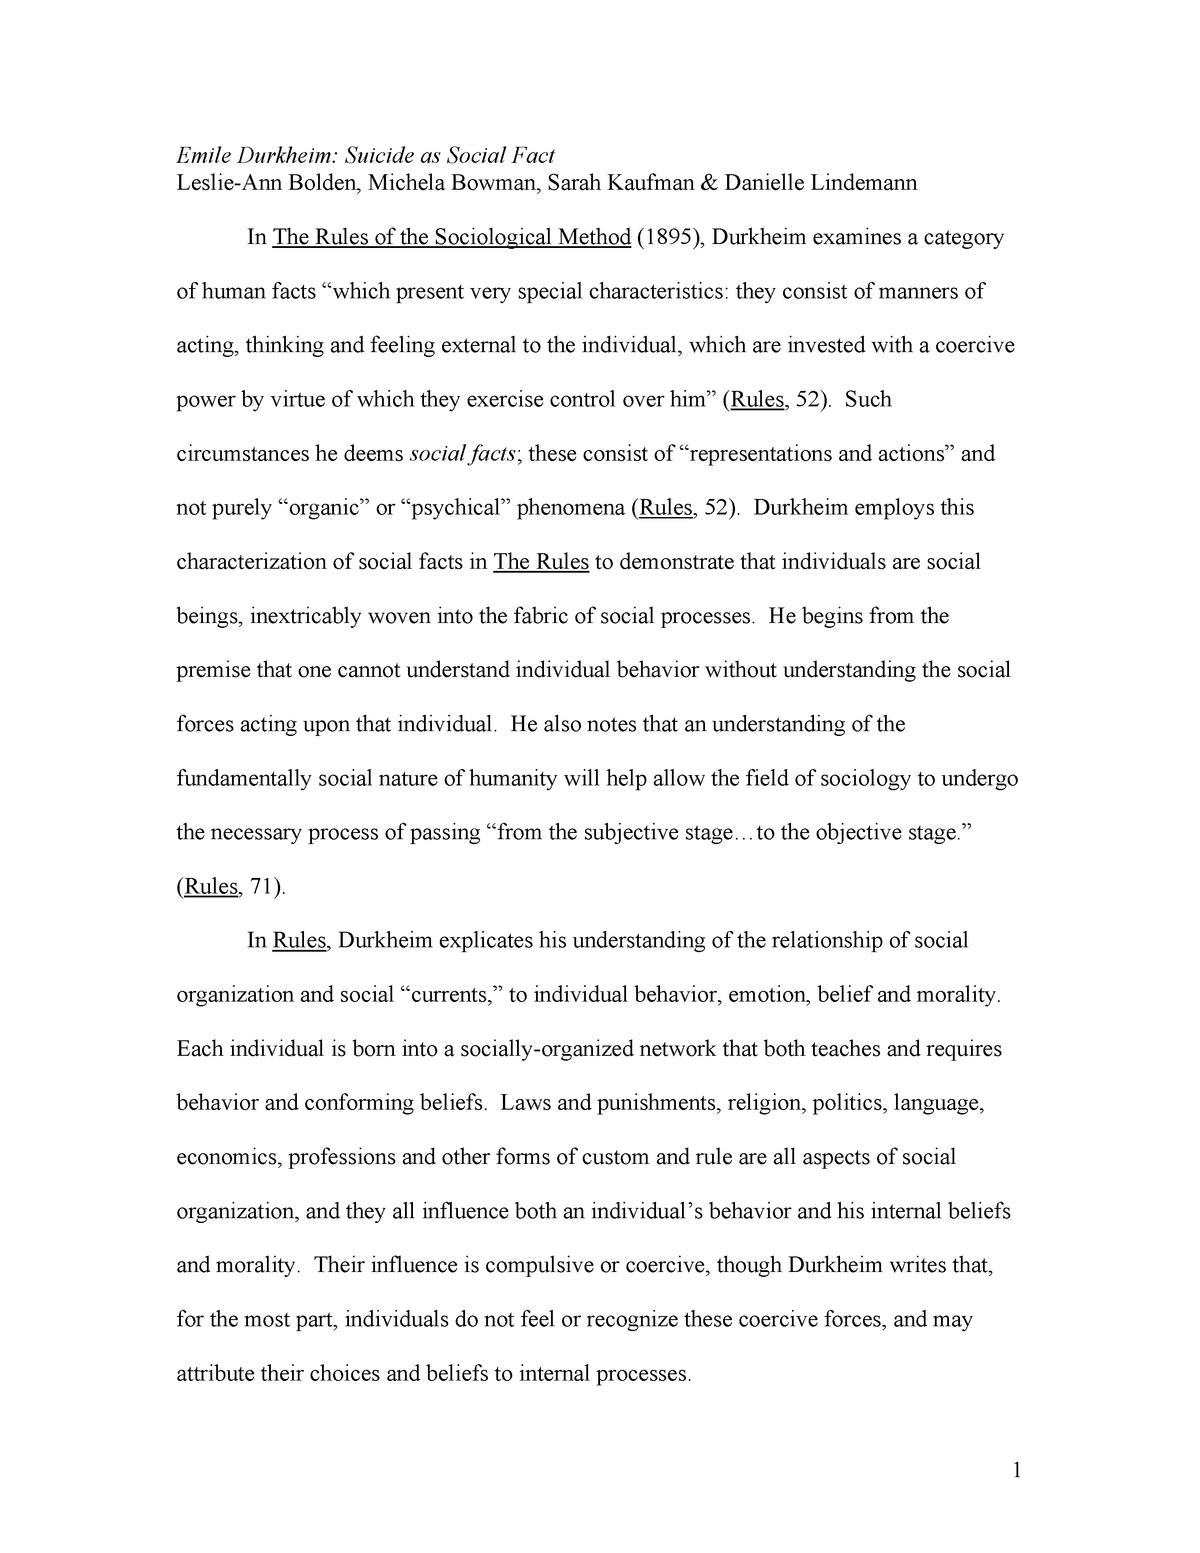 The Rules of Sociological Method - StuDocu Summary Library